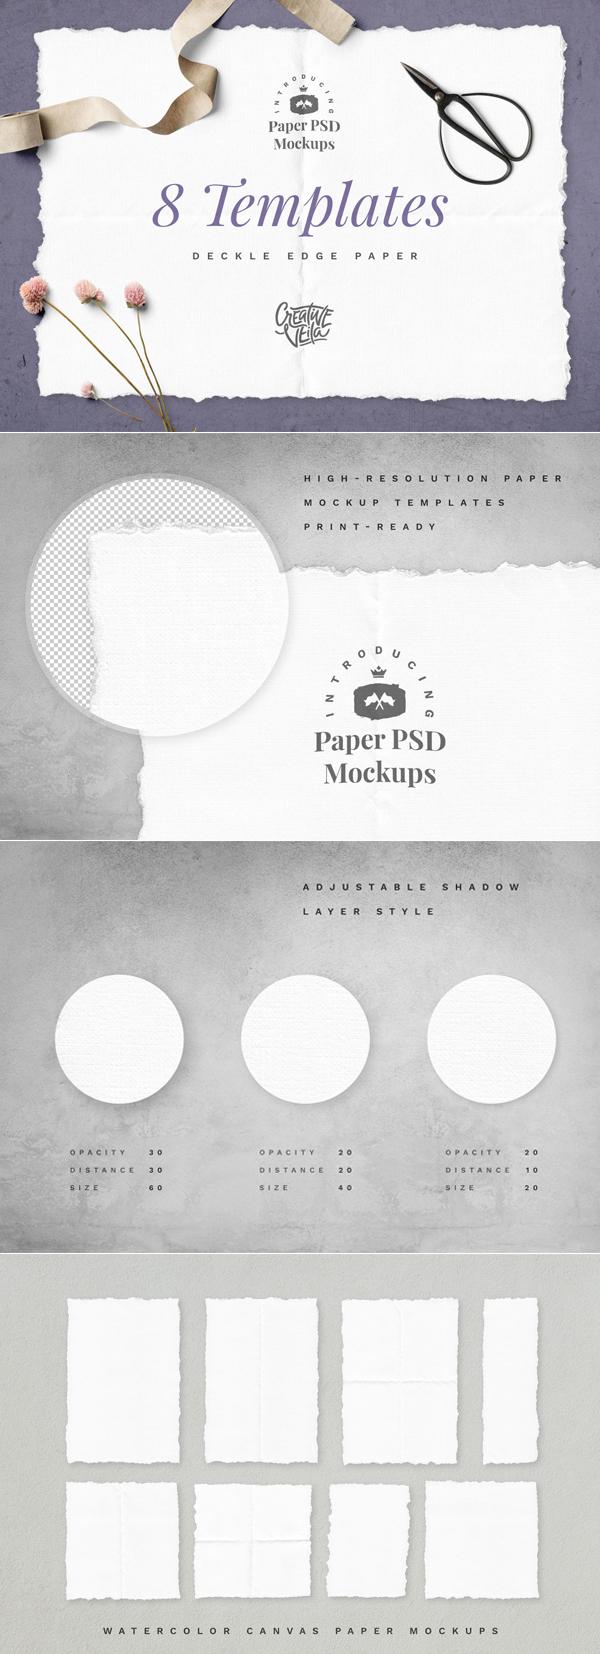 Freebies for 2019: Free Deckle Edge Paper Mockup Set